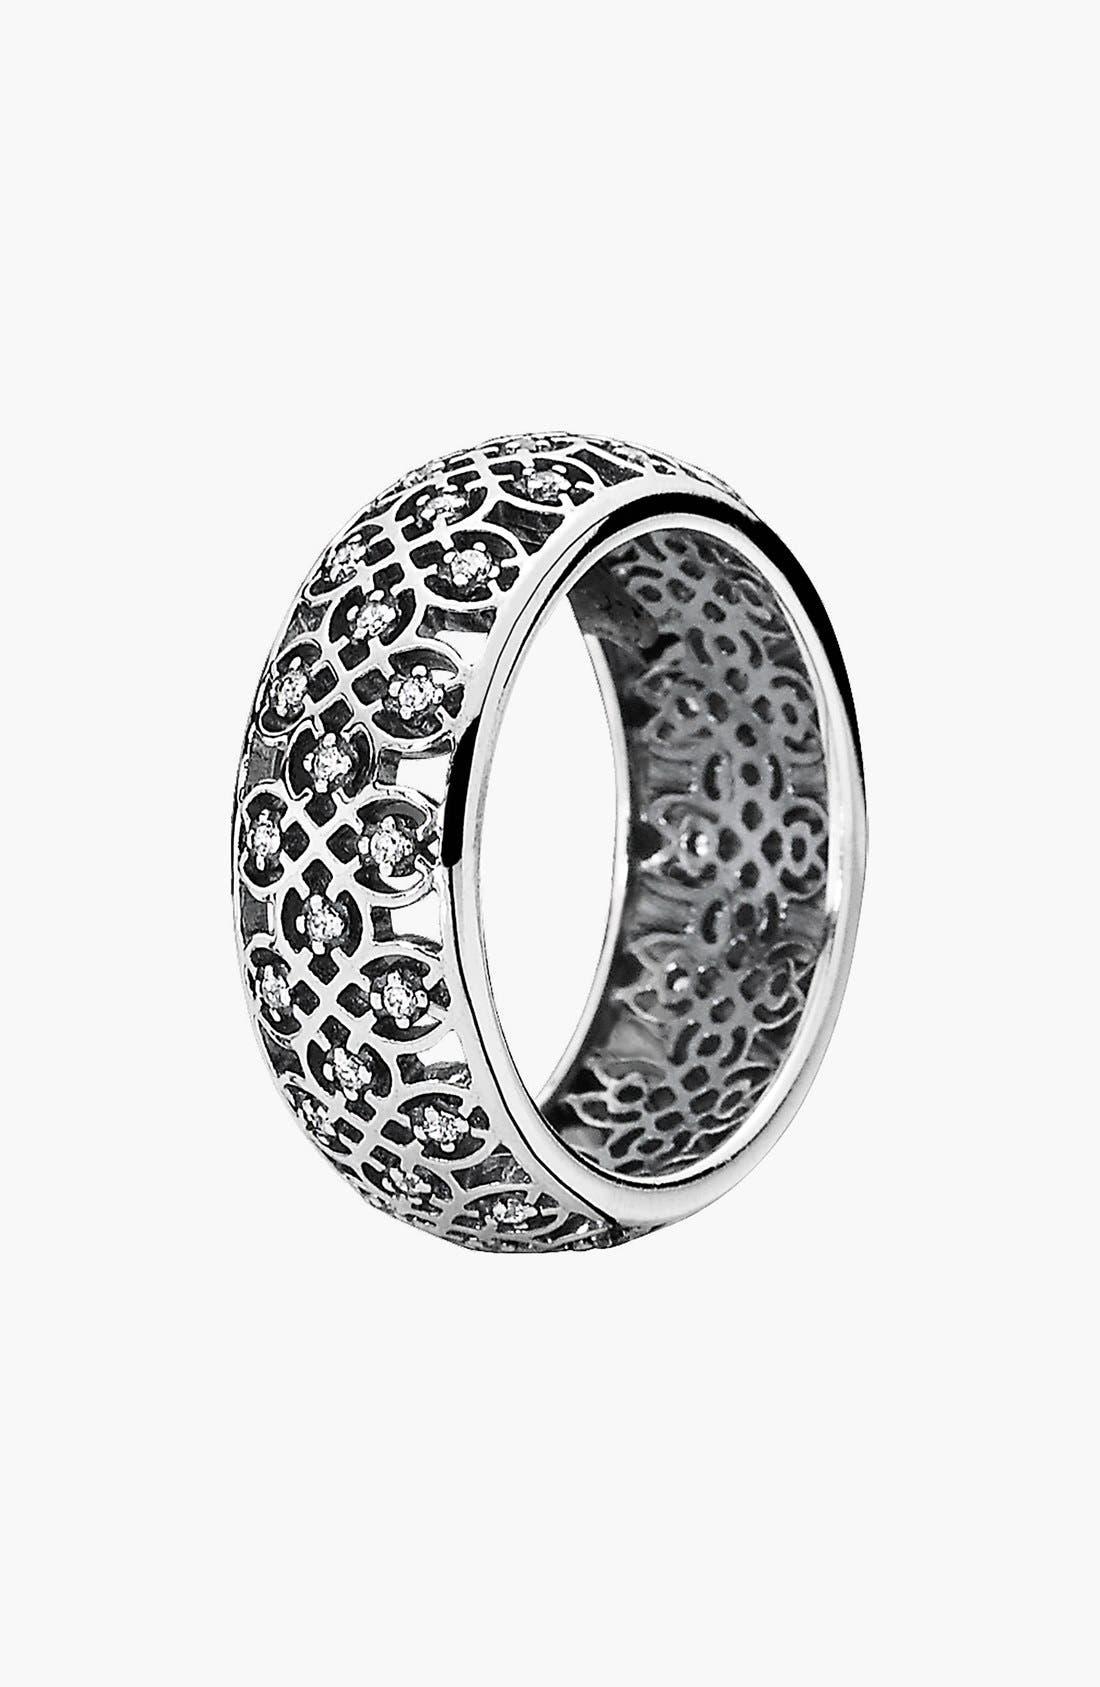 Main Image - PANDORA Lattice Ring